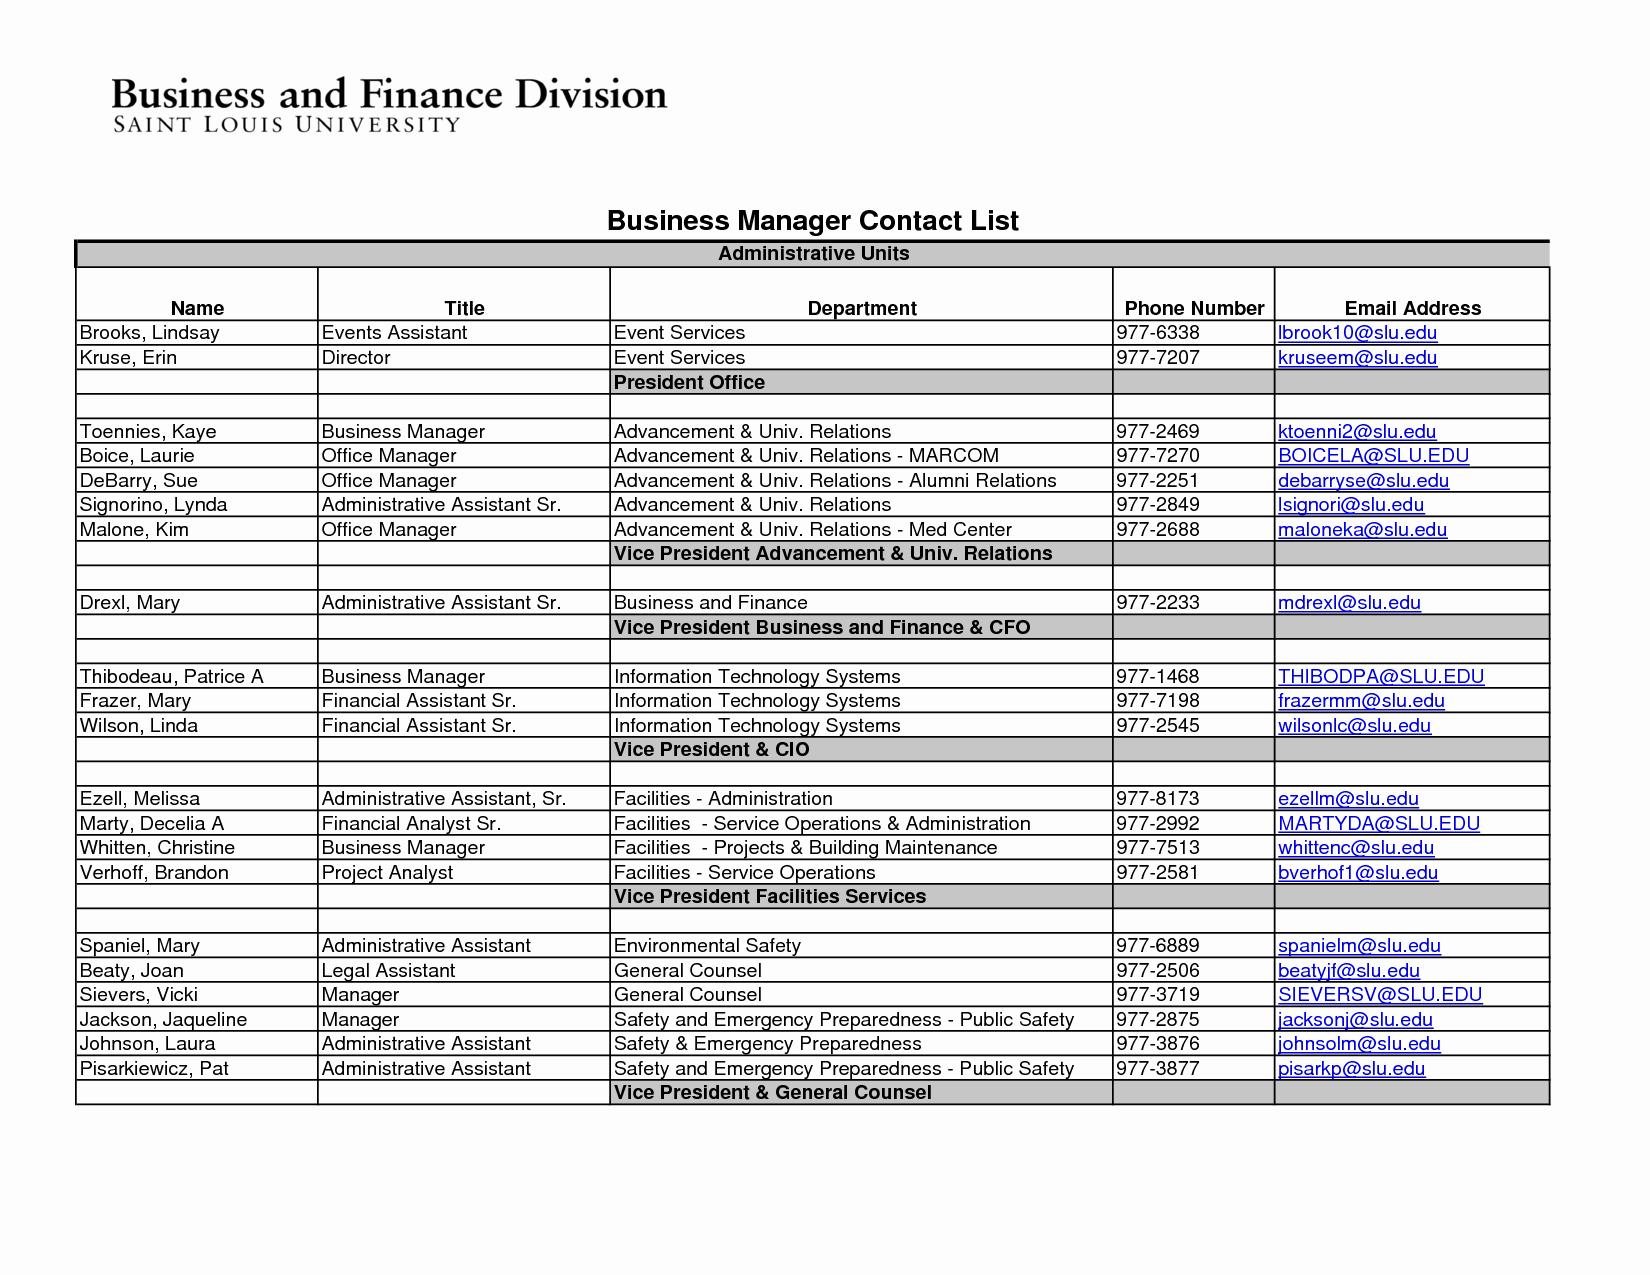 Employee Phone List Template Free Fresh Phone List Template Excel Portablegasgrillweber